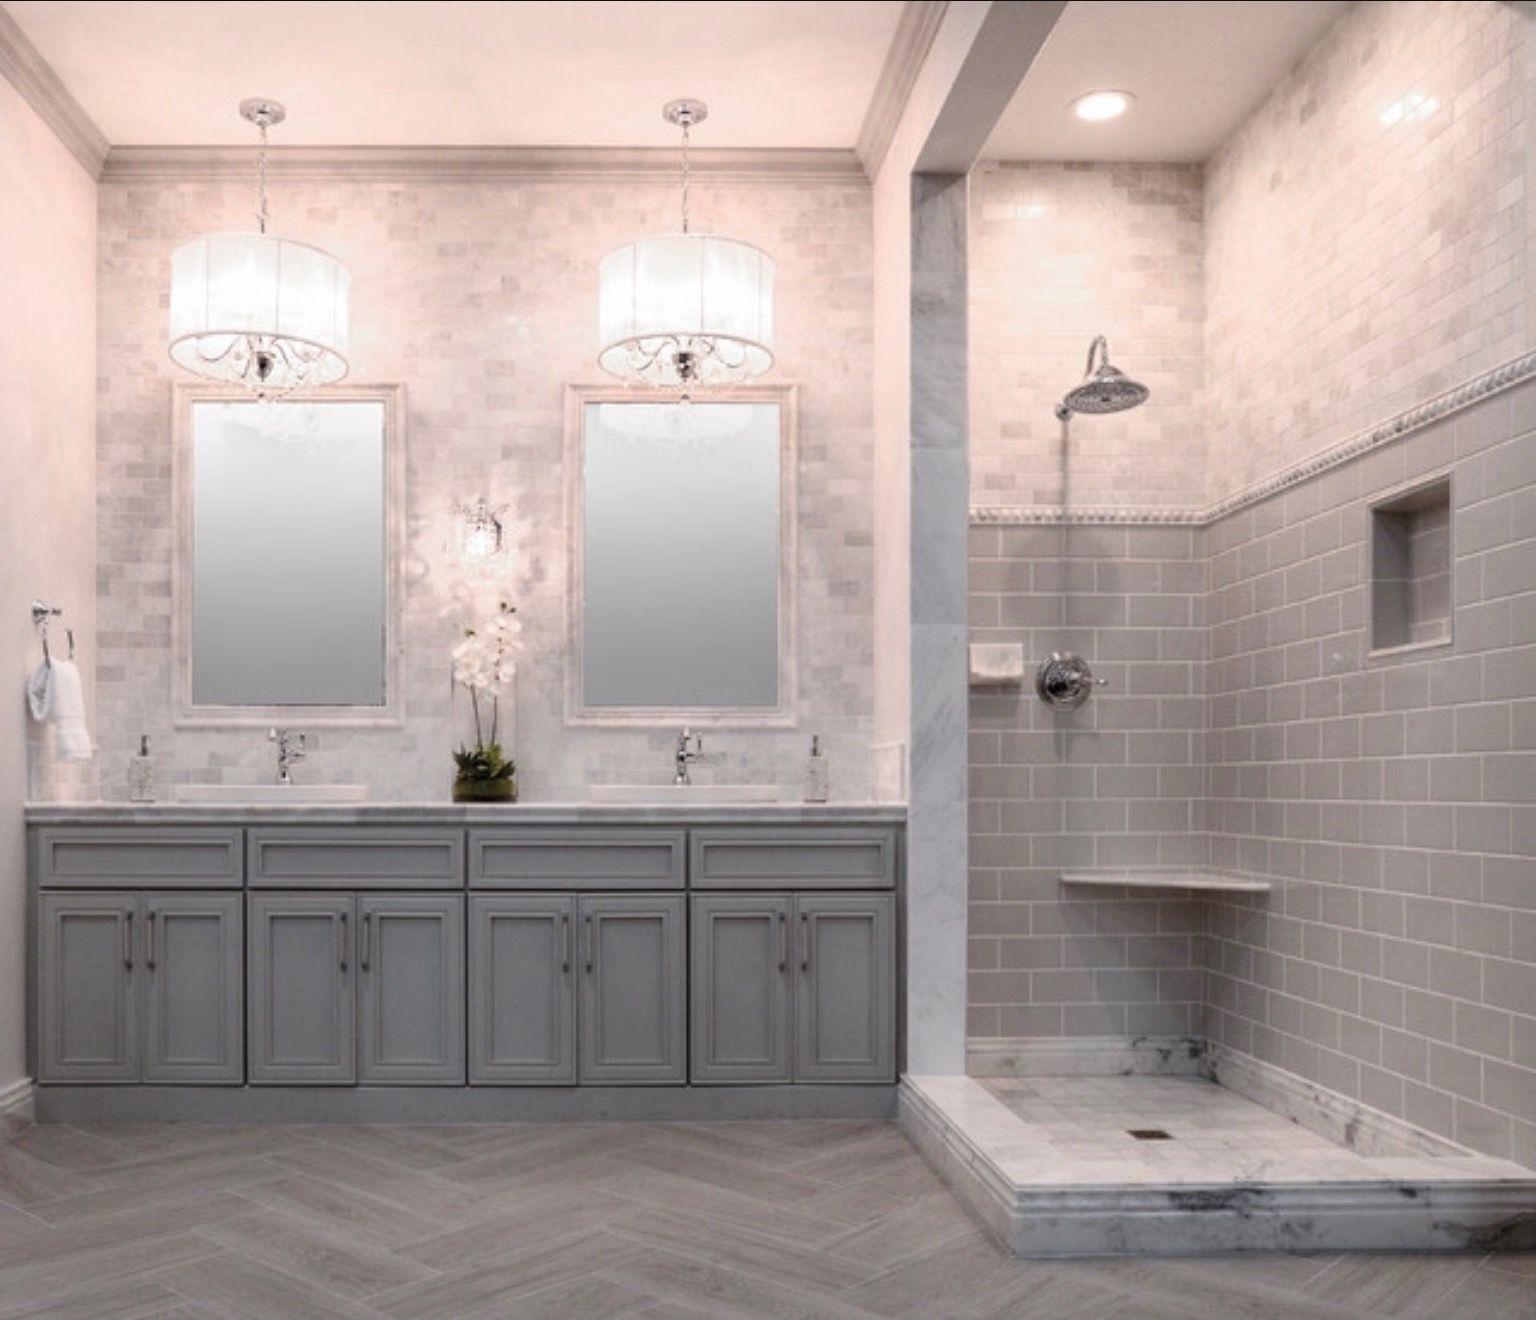 pinkristina stout on bathrooms  bathroom trends grey